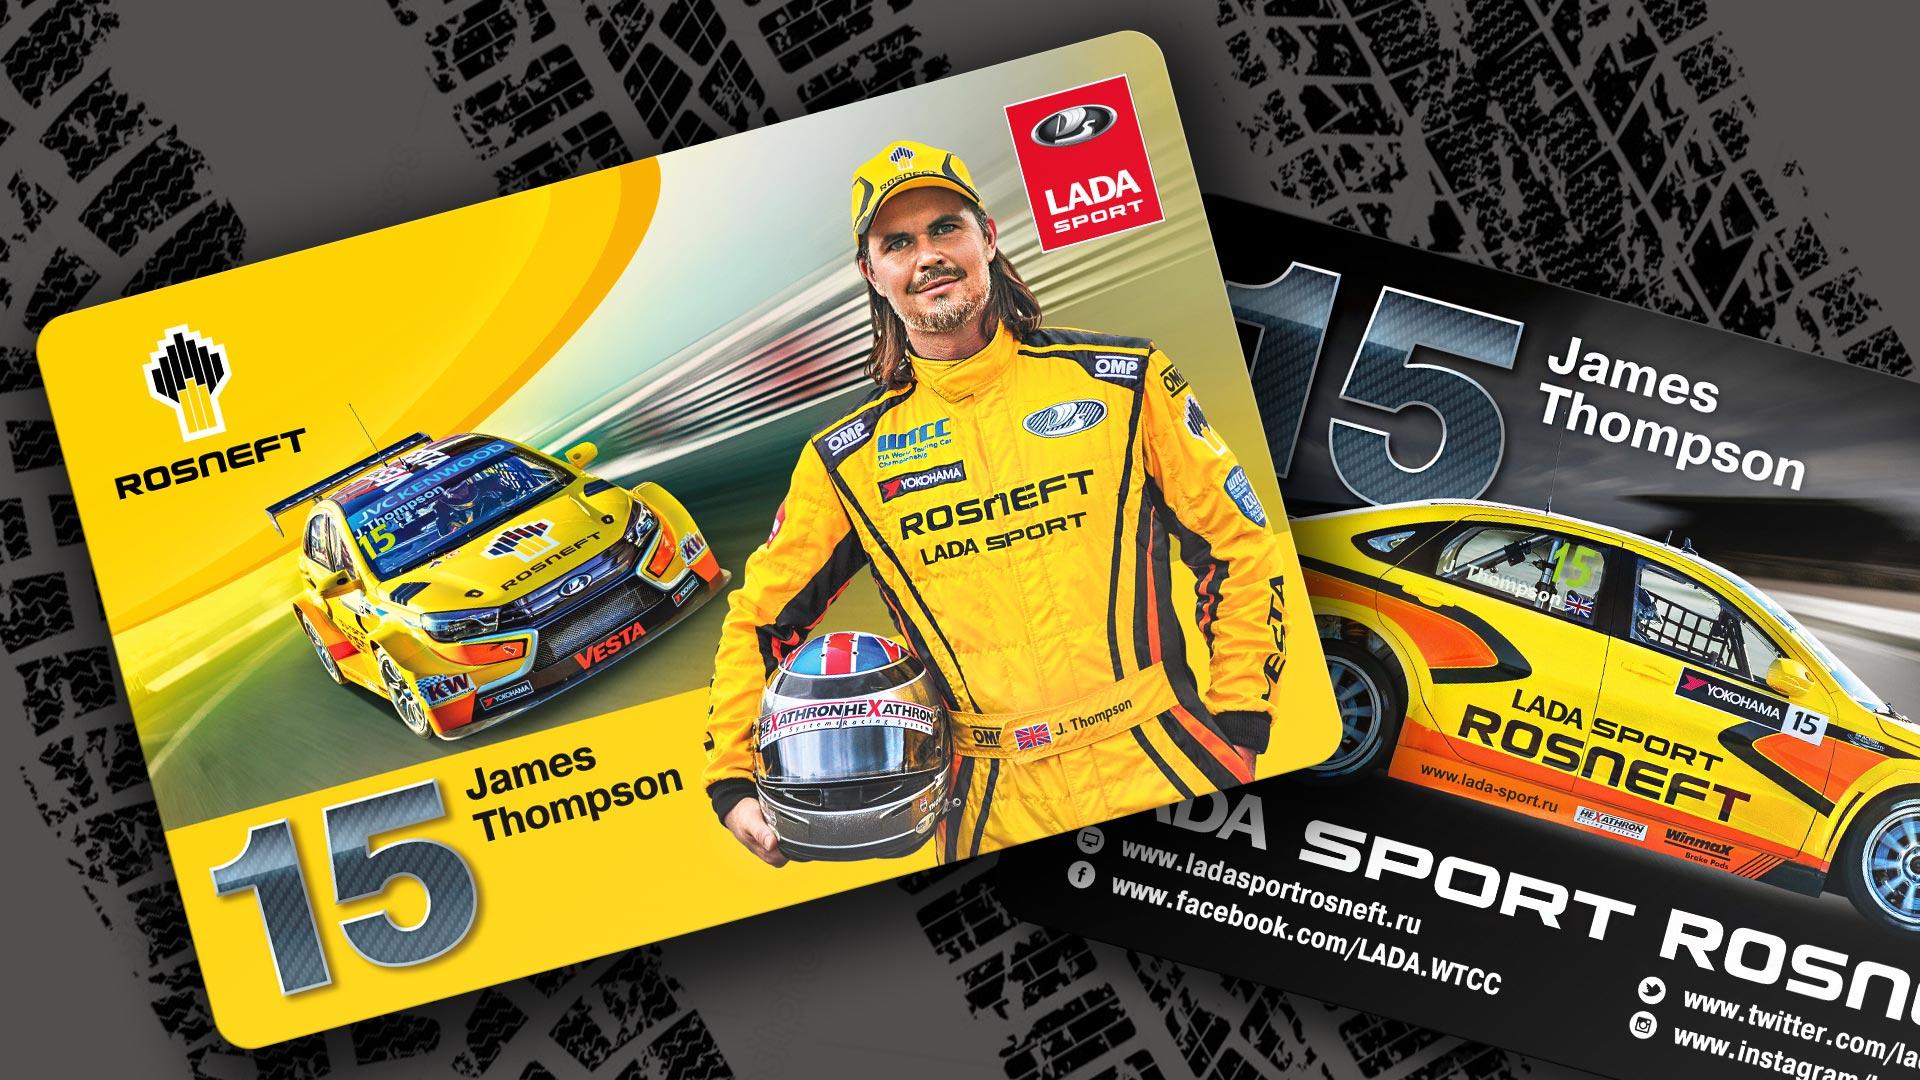 Сувенирные карточки Lada Sport и Rosneft